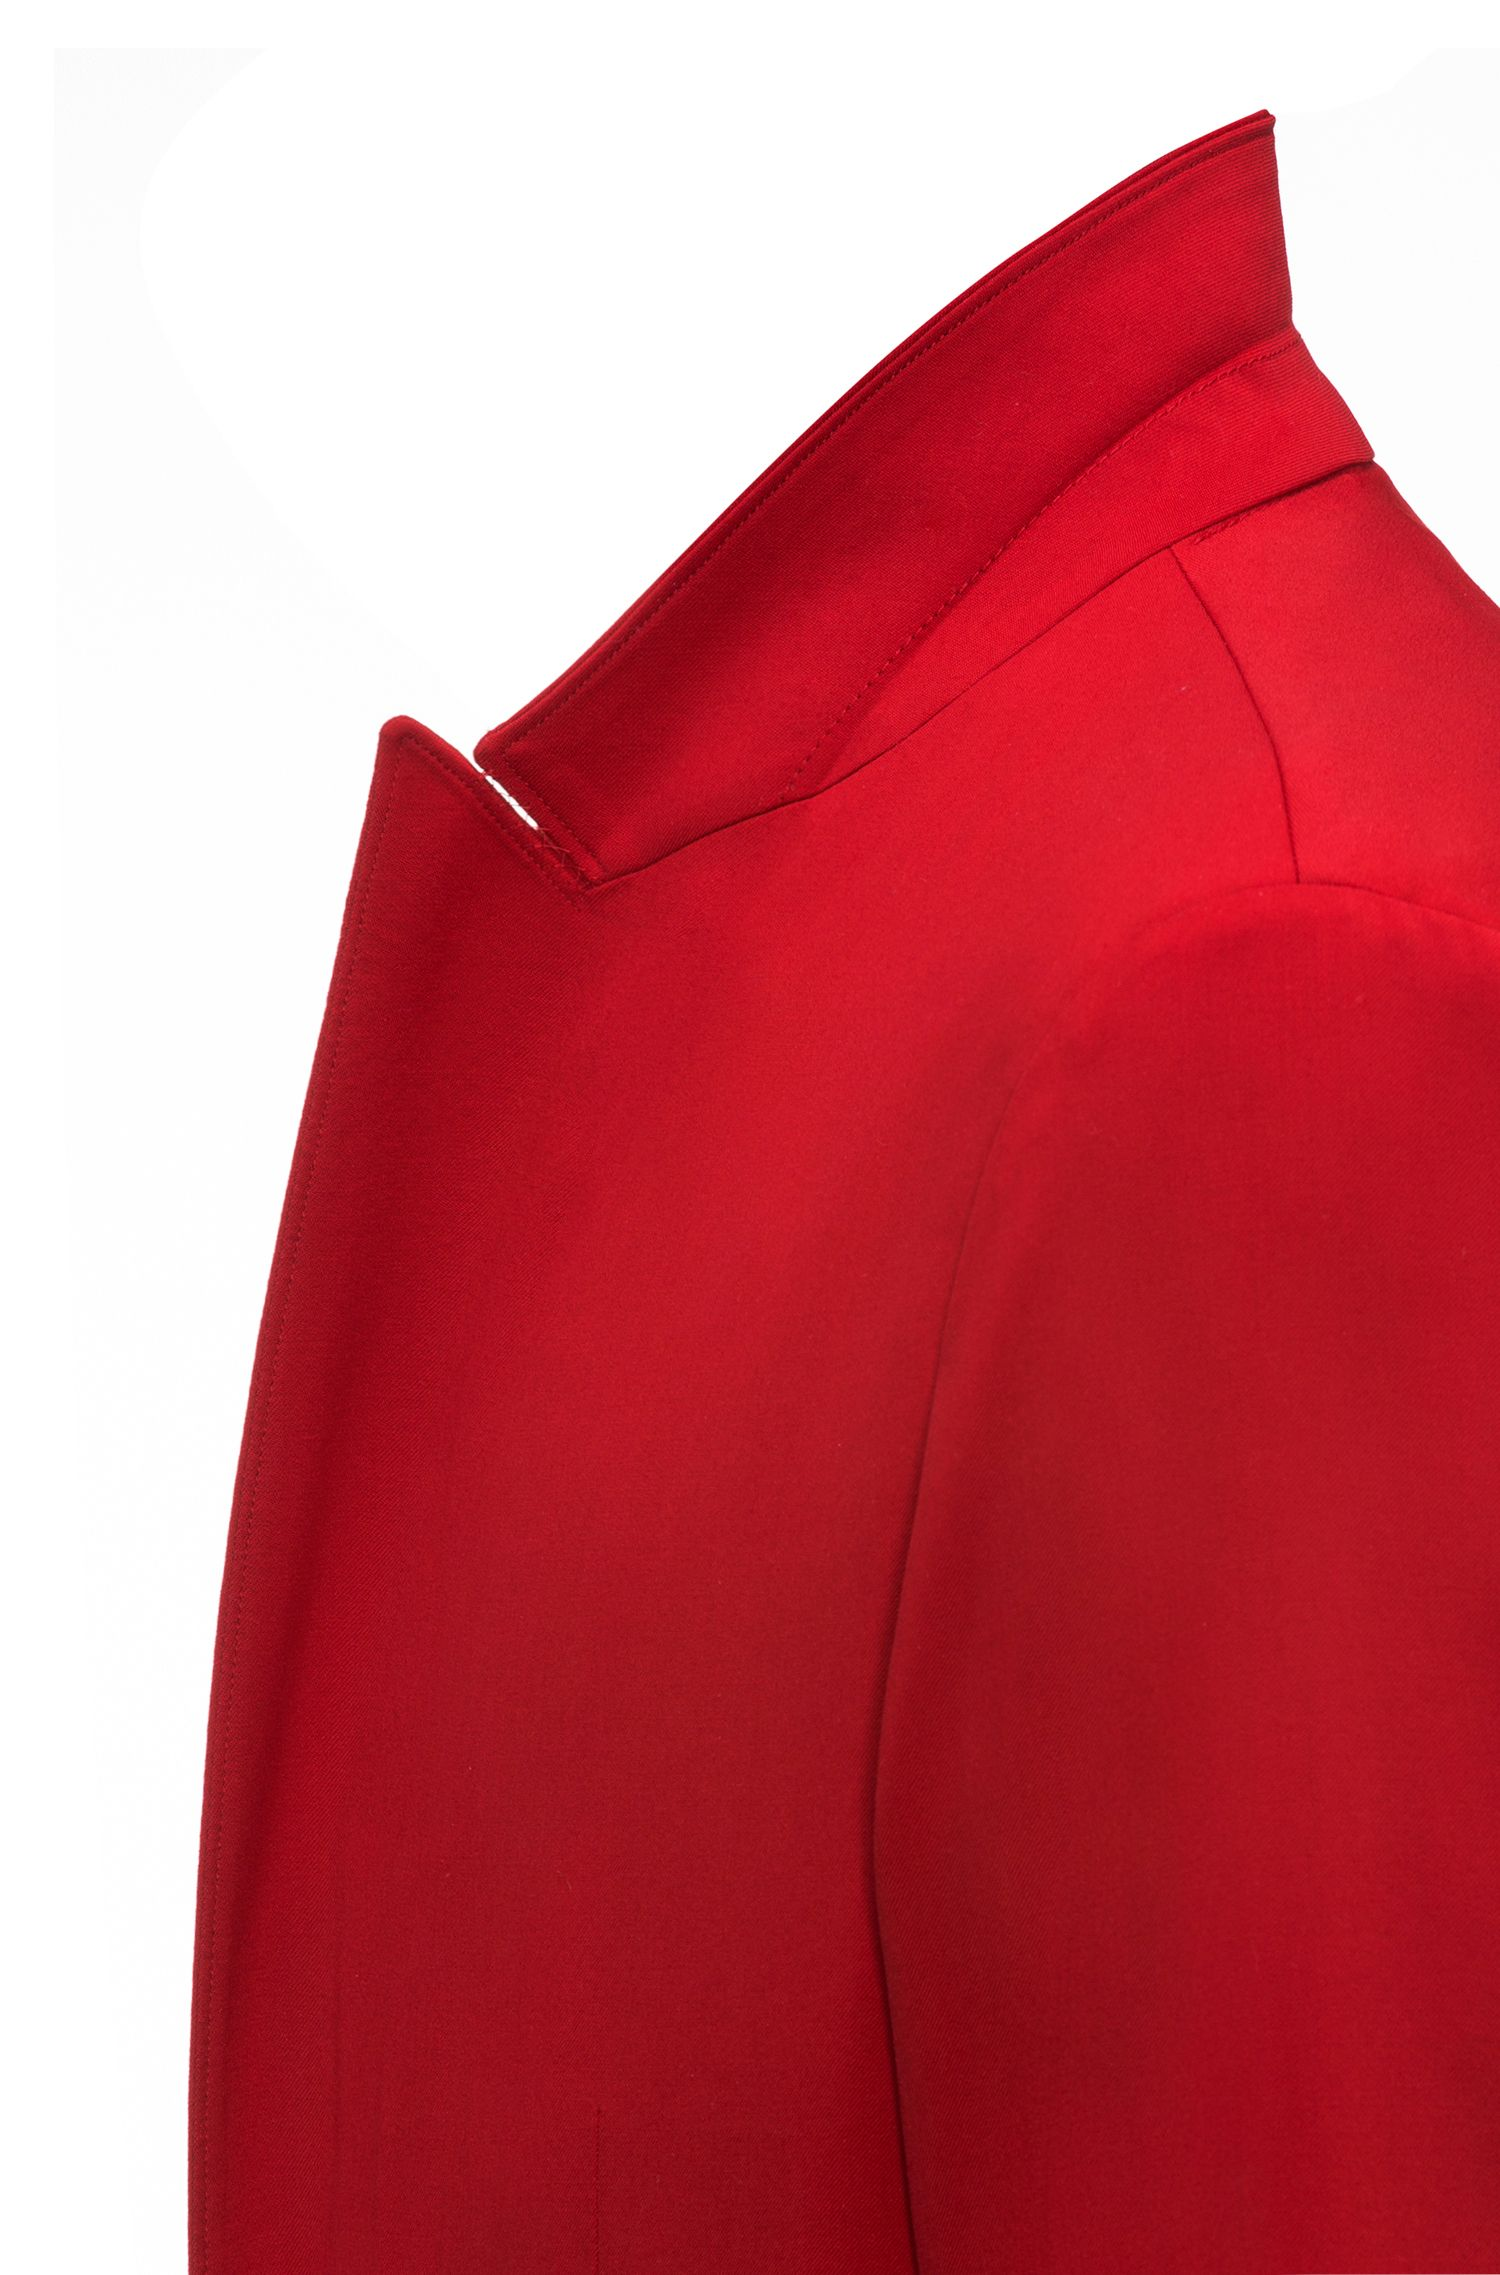 Oversized woljas met twee rijen knopen